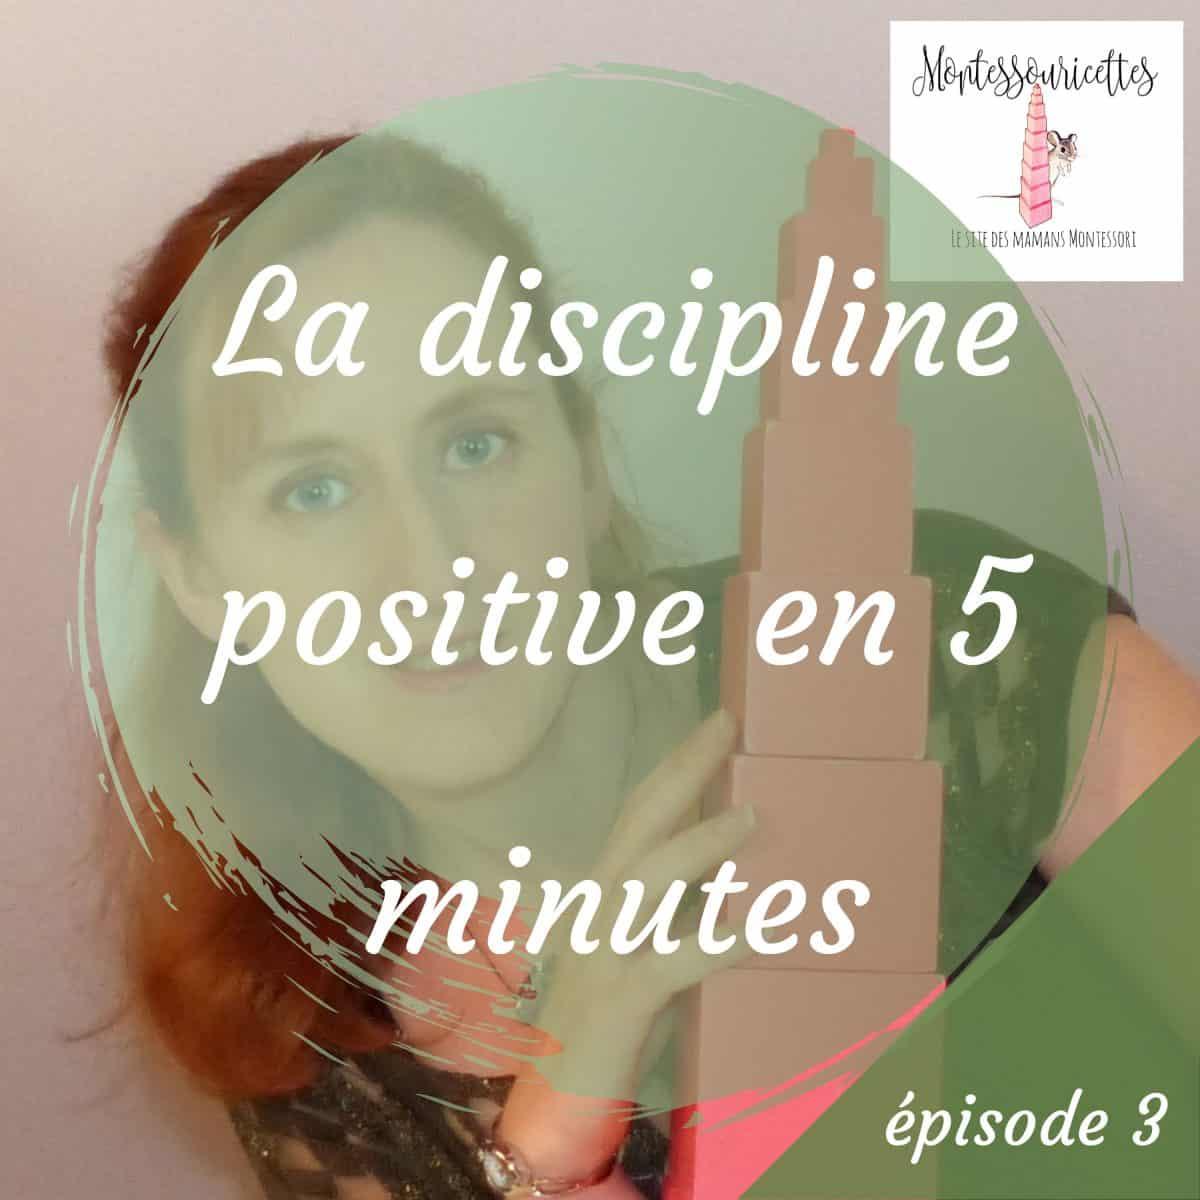 La discipline positive expliquée en 5 minutes